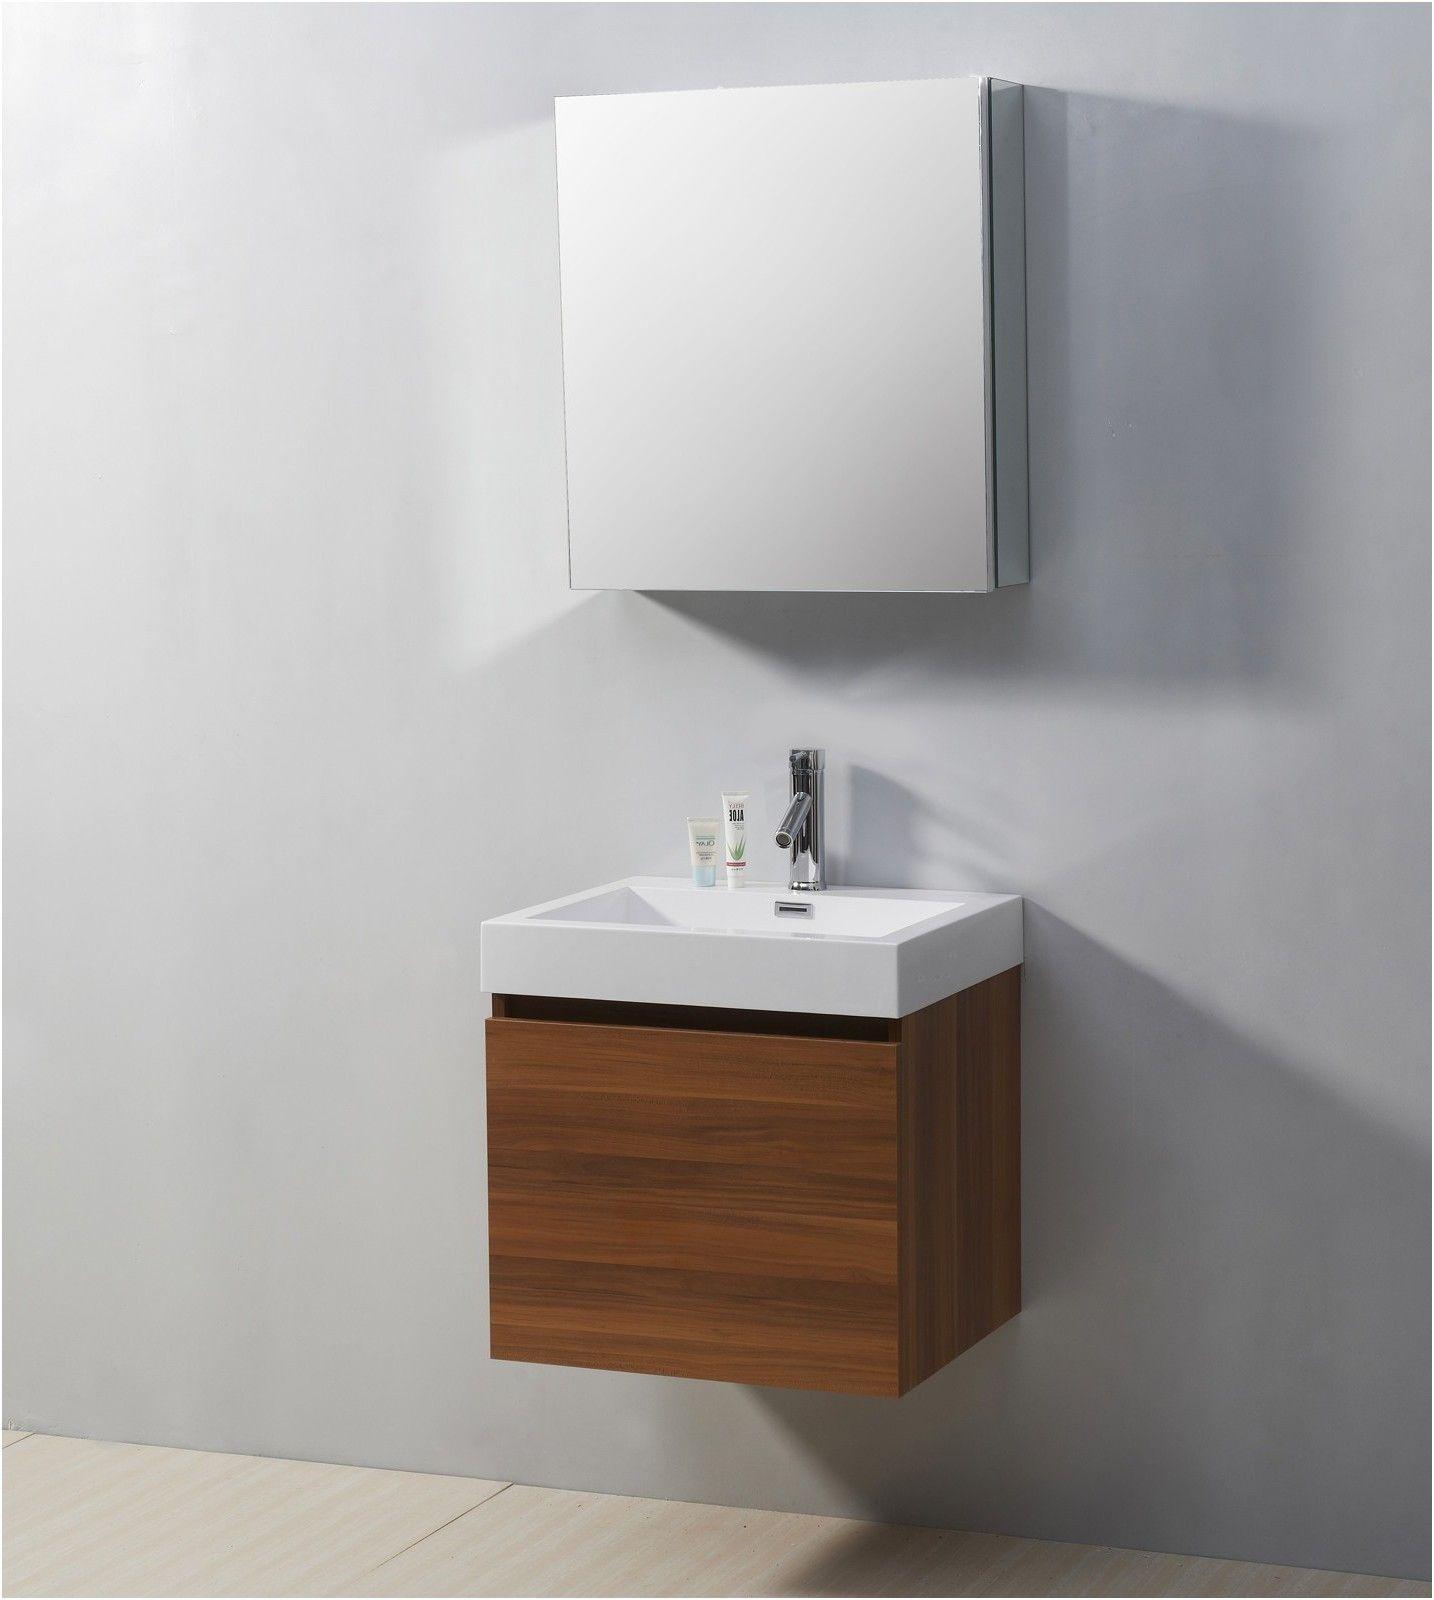 Narrow Bathroom Vanity Narrow Bathroom Vanity Find An Entry Or From Narrow White Bathroom Cab Small Bathroom Vanities Bathroom Sink Design Small Bathroom Sinks